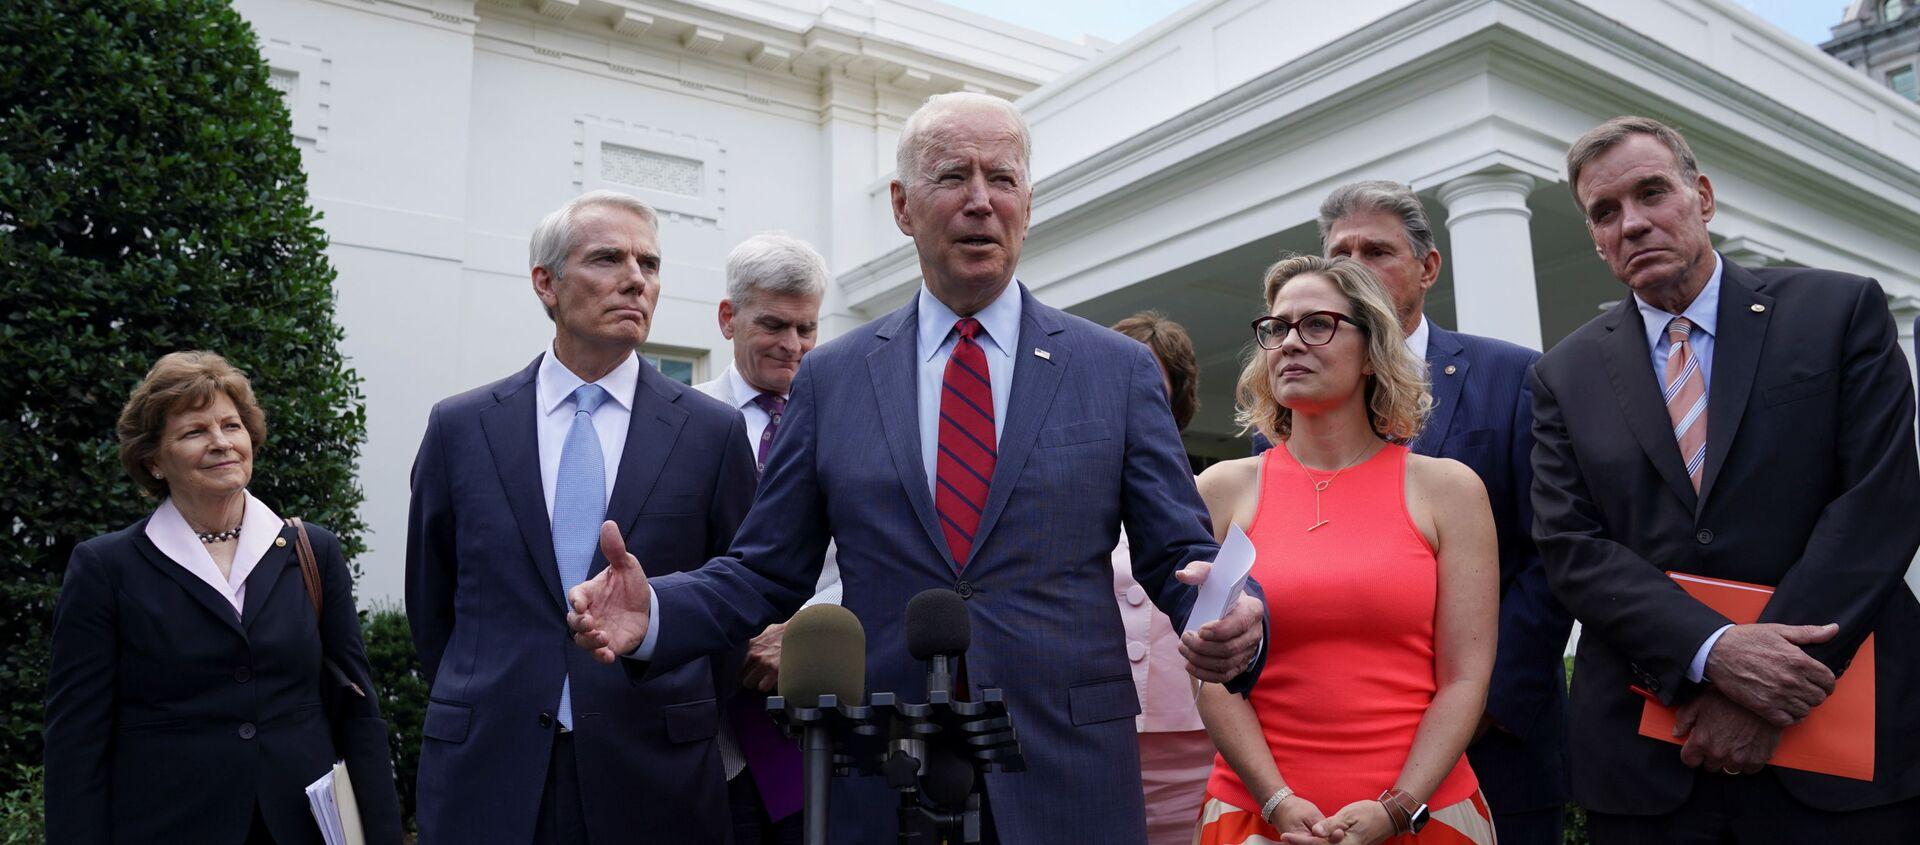 U.S. President Joe Biden speaks following a bipartisan meeting with U.S. senators about the proposed framework for the infrastructure bill, at the White House in Washington, U.S., June 24, 2021. - Sputnik International, 1920, 24.06.2021